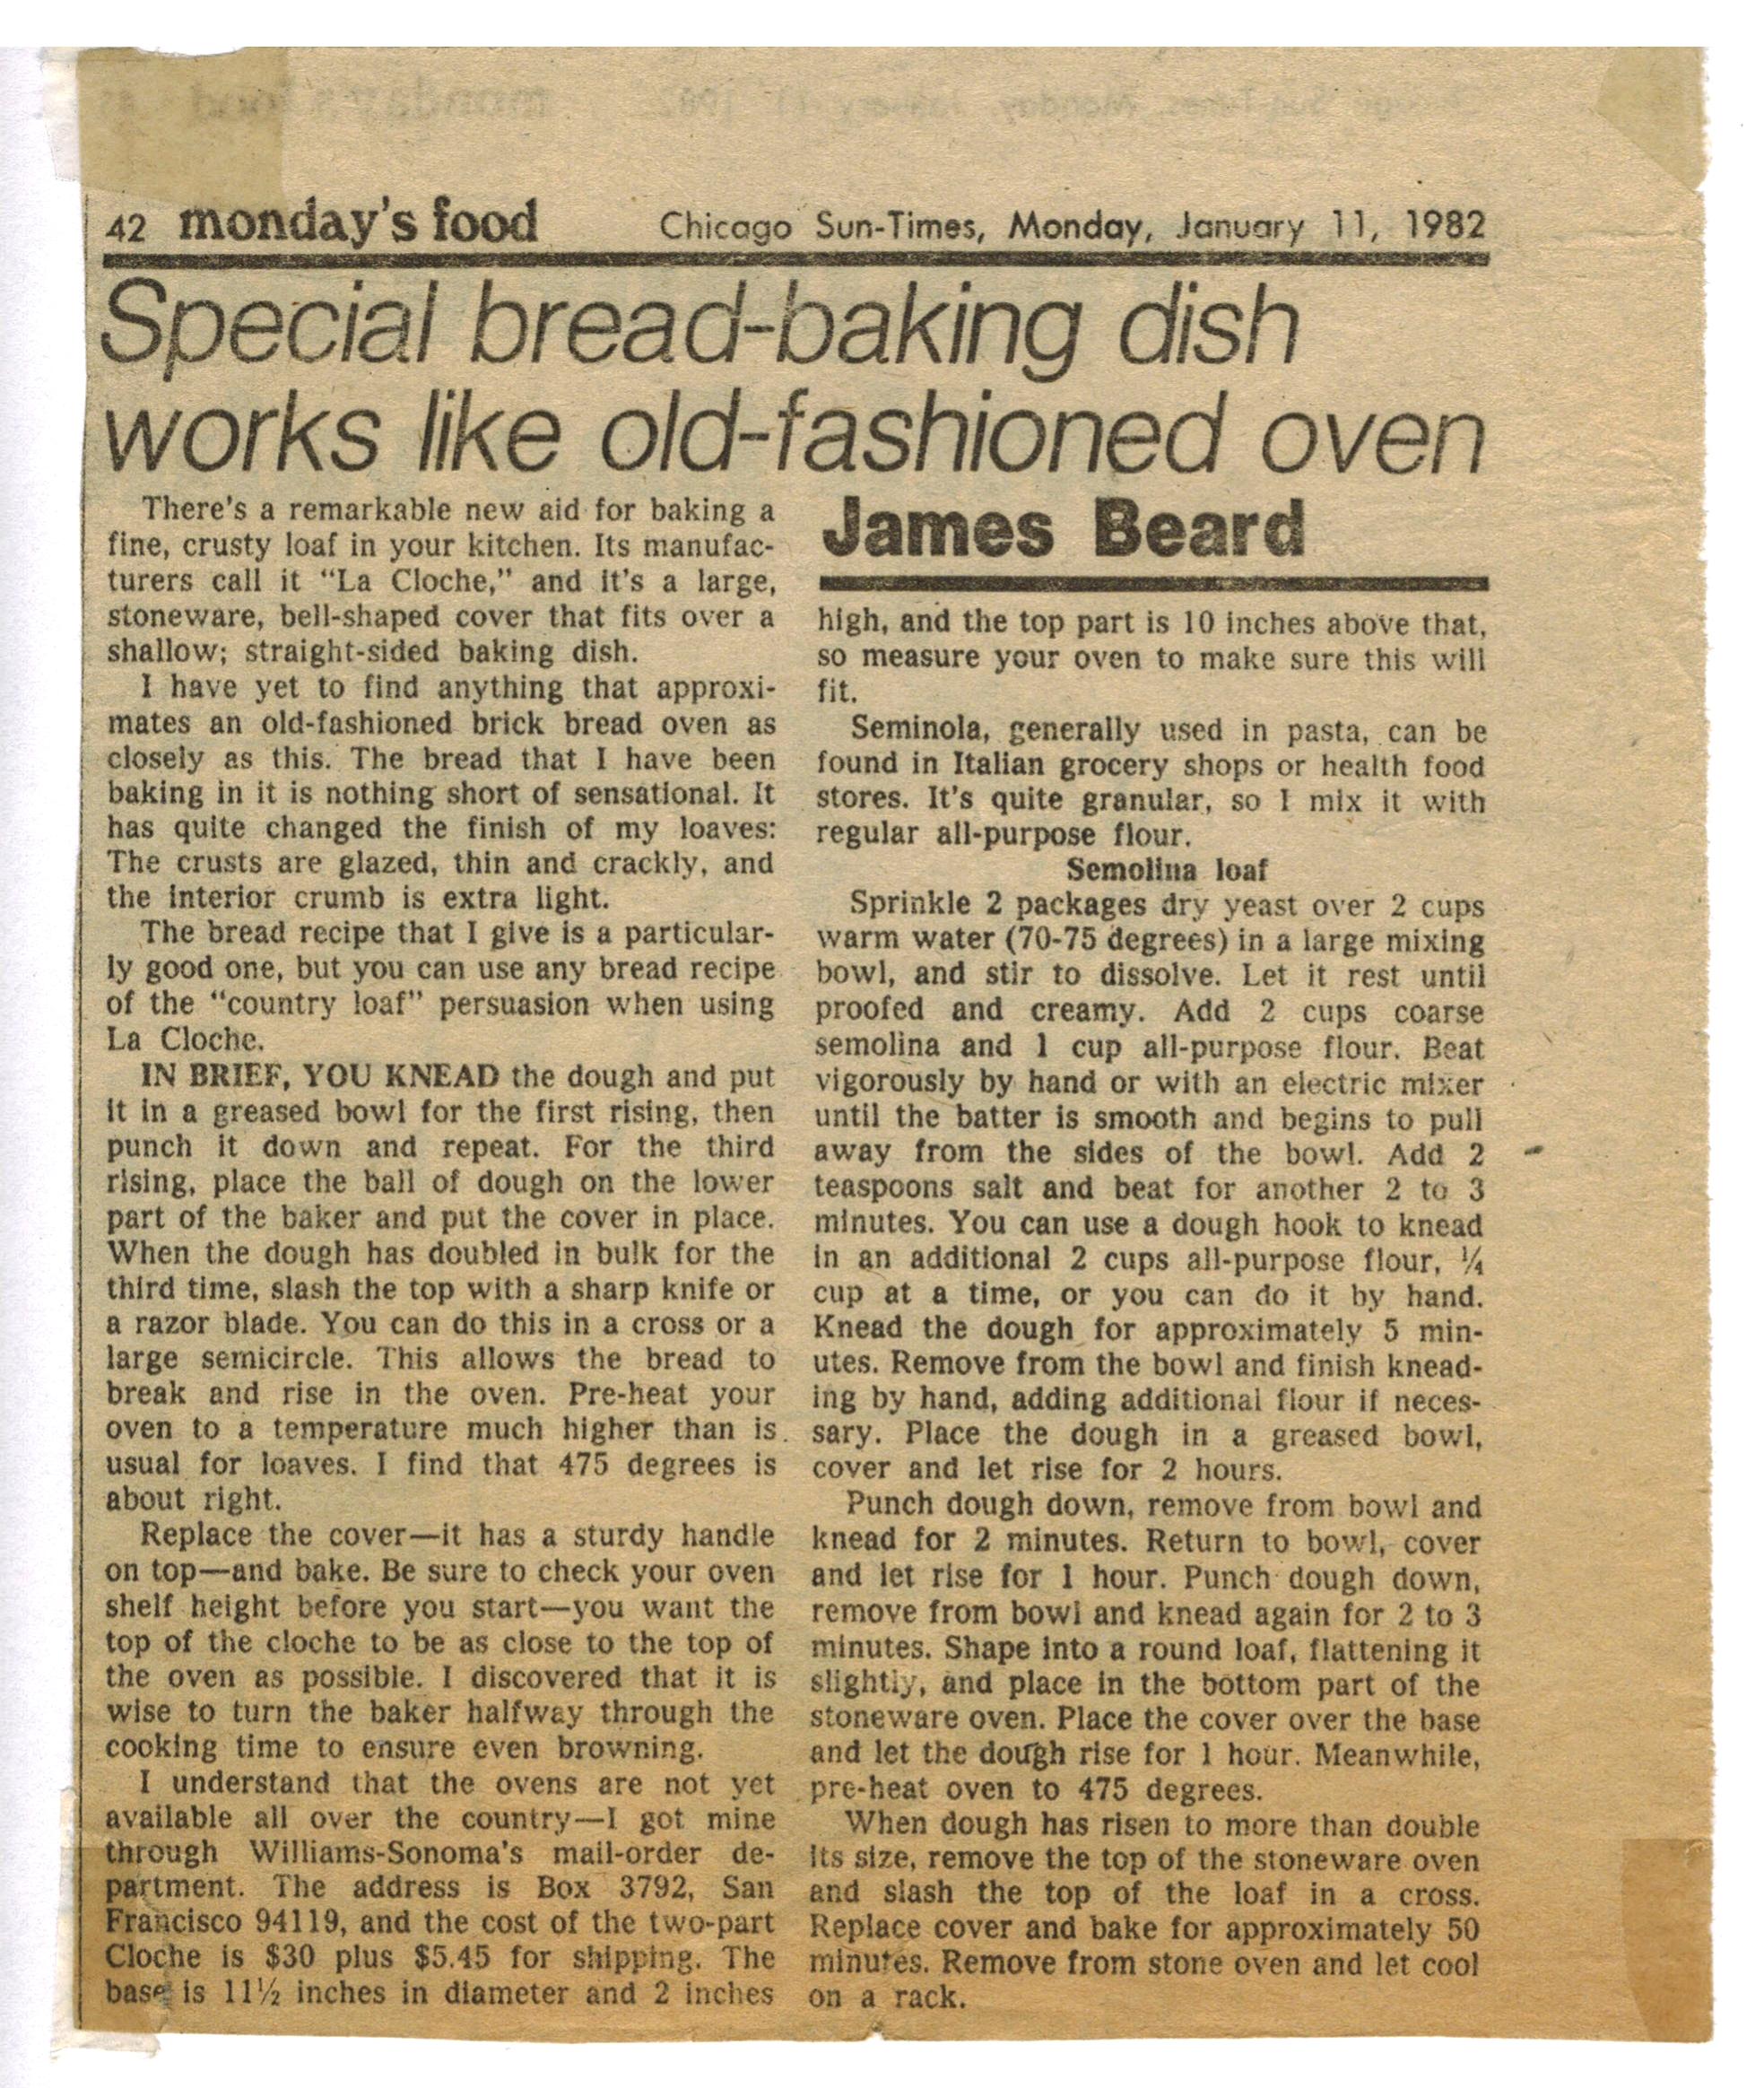 james-beard-article-1982.jpg